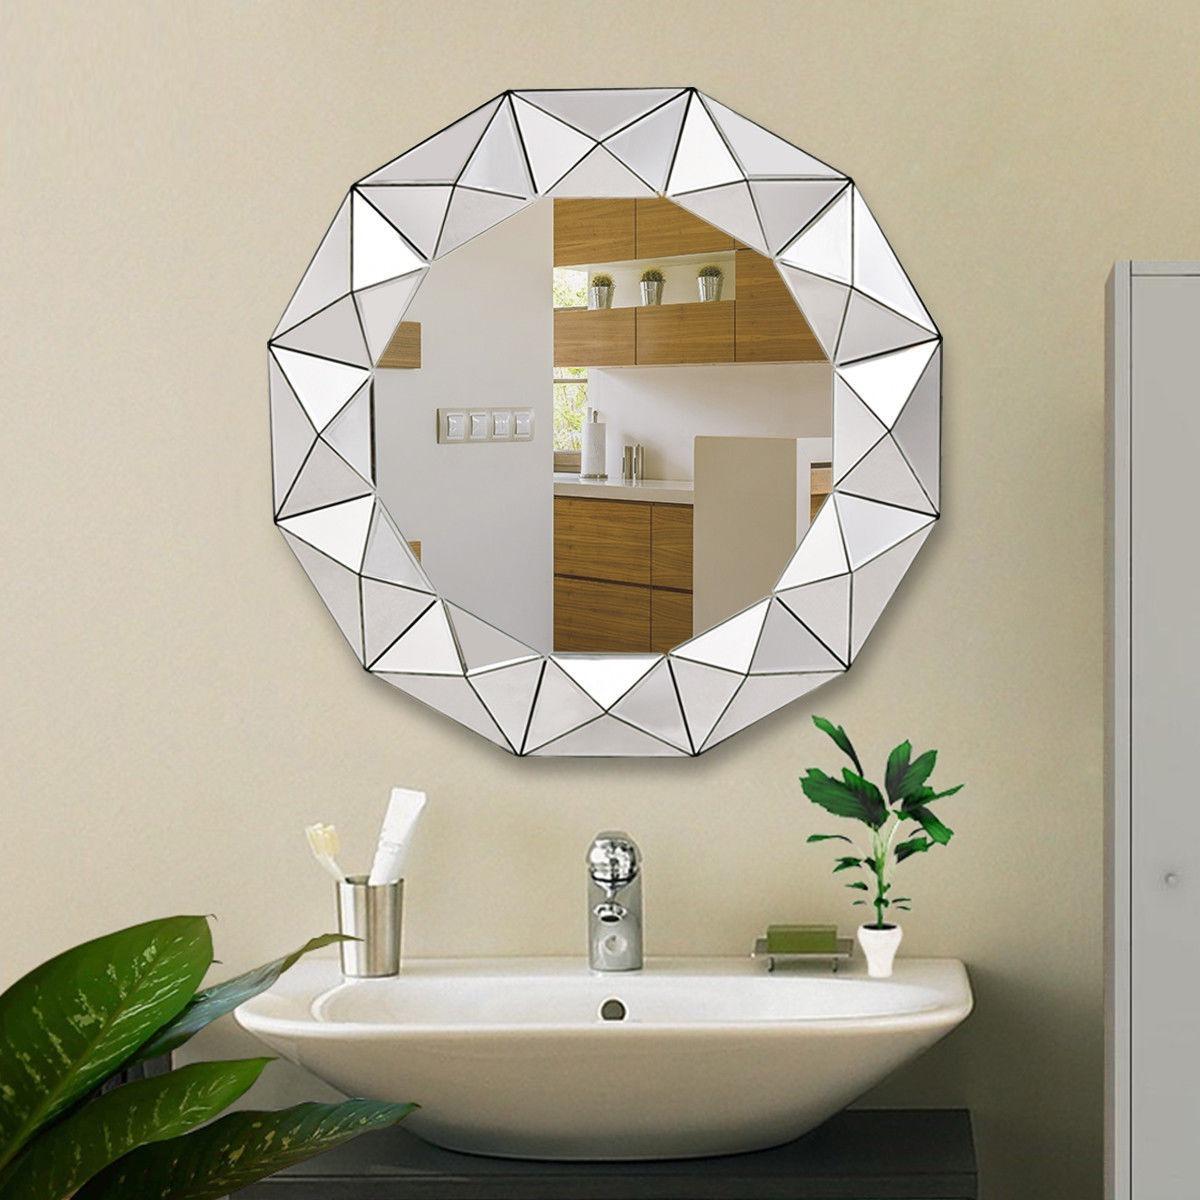 Espejo para ba o redondo biselado 31 5 diametro 3 080 for Bano con espejo redondo